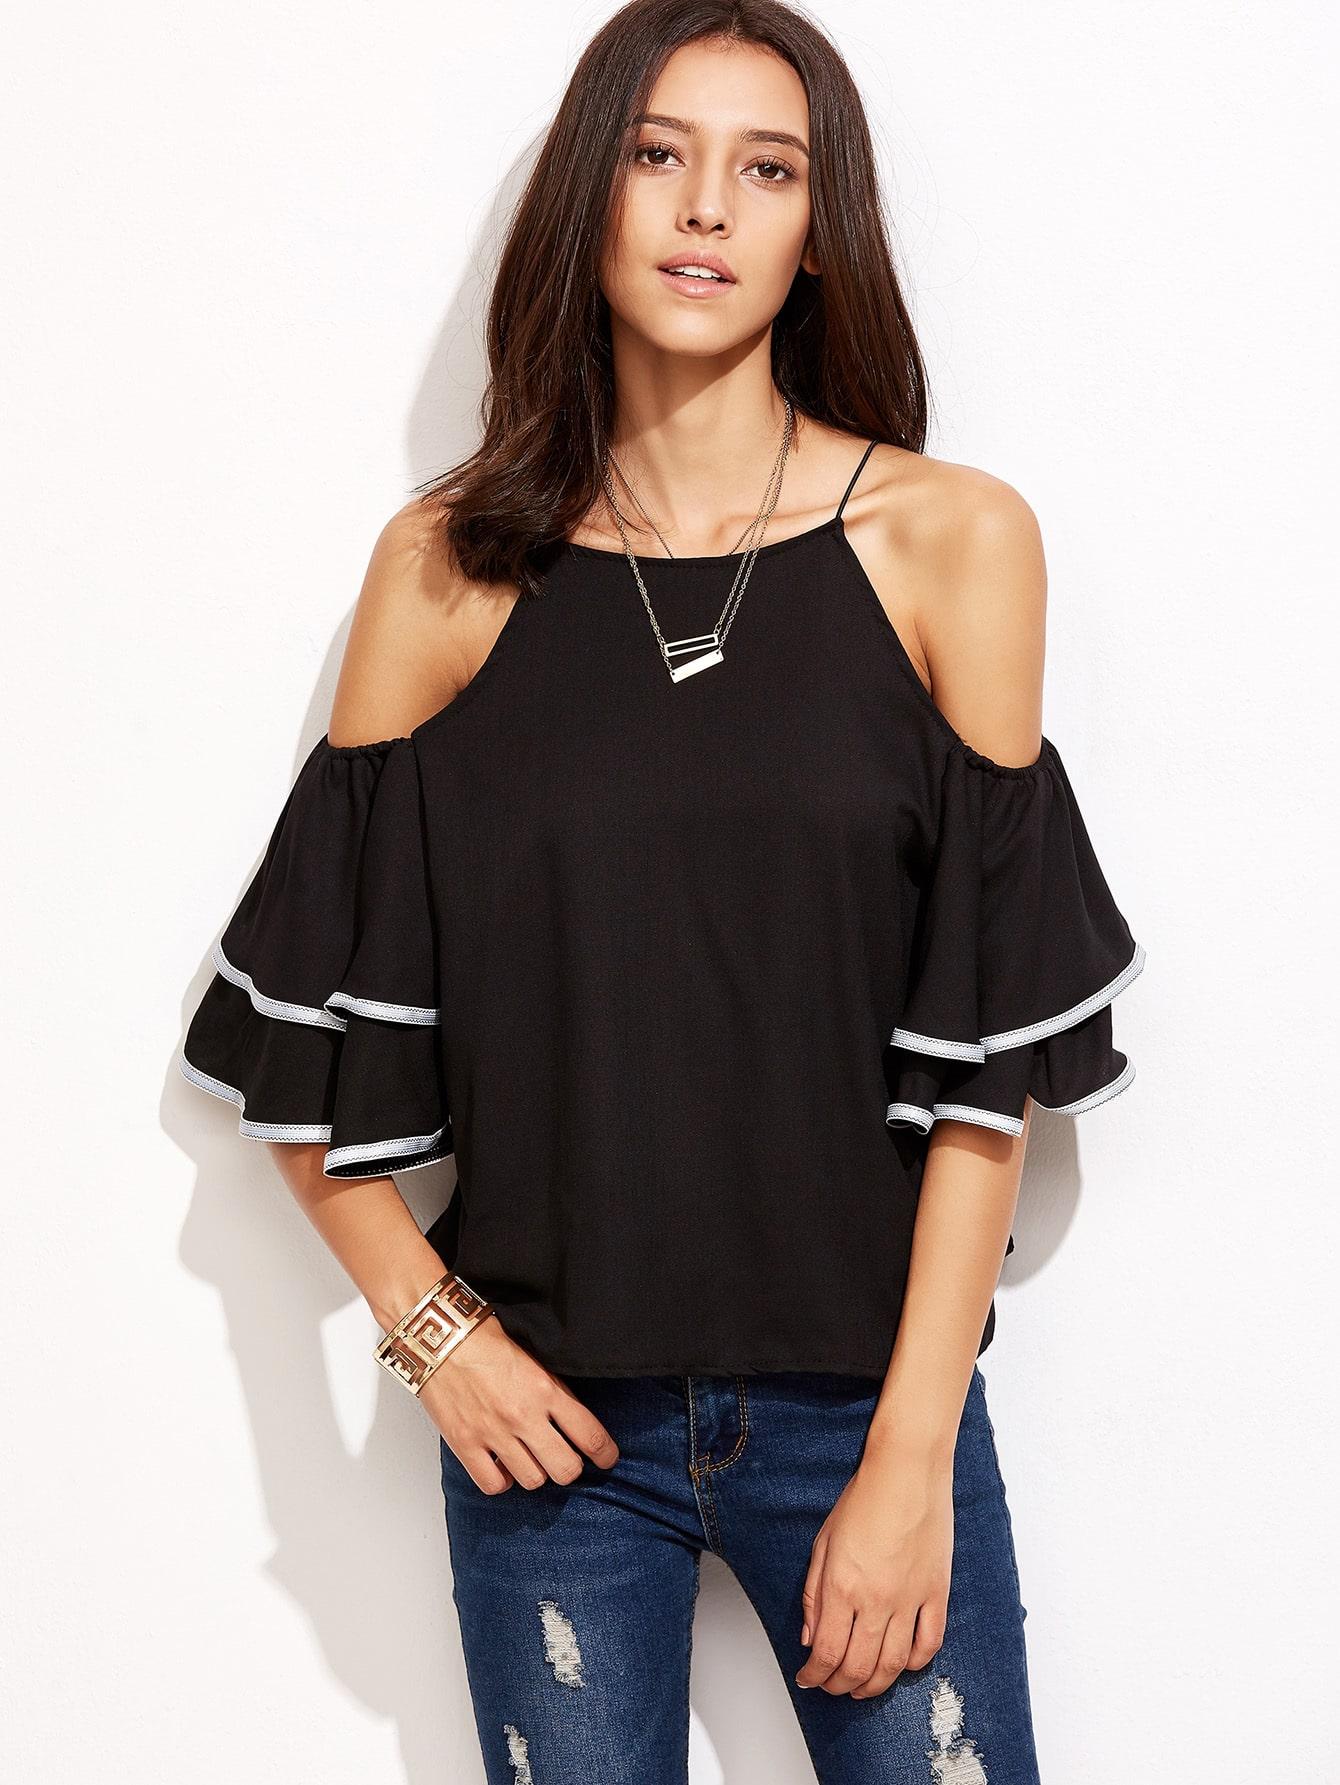 blouse160906101_2